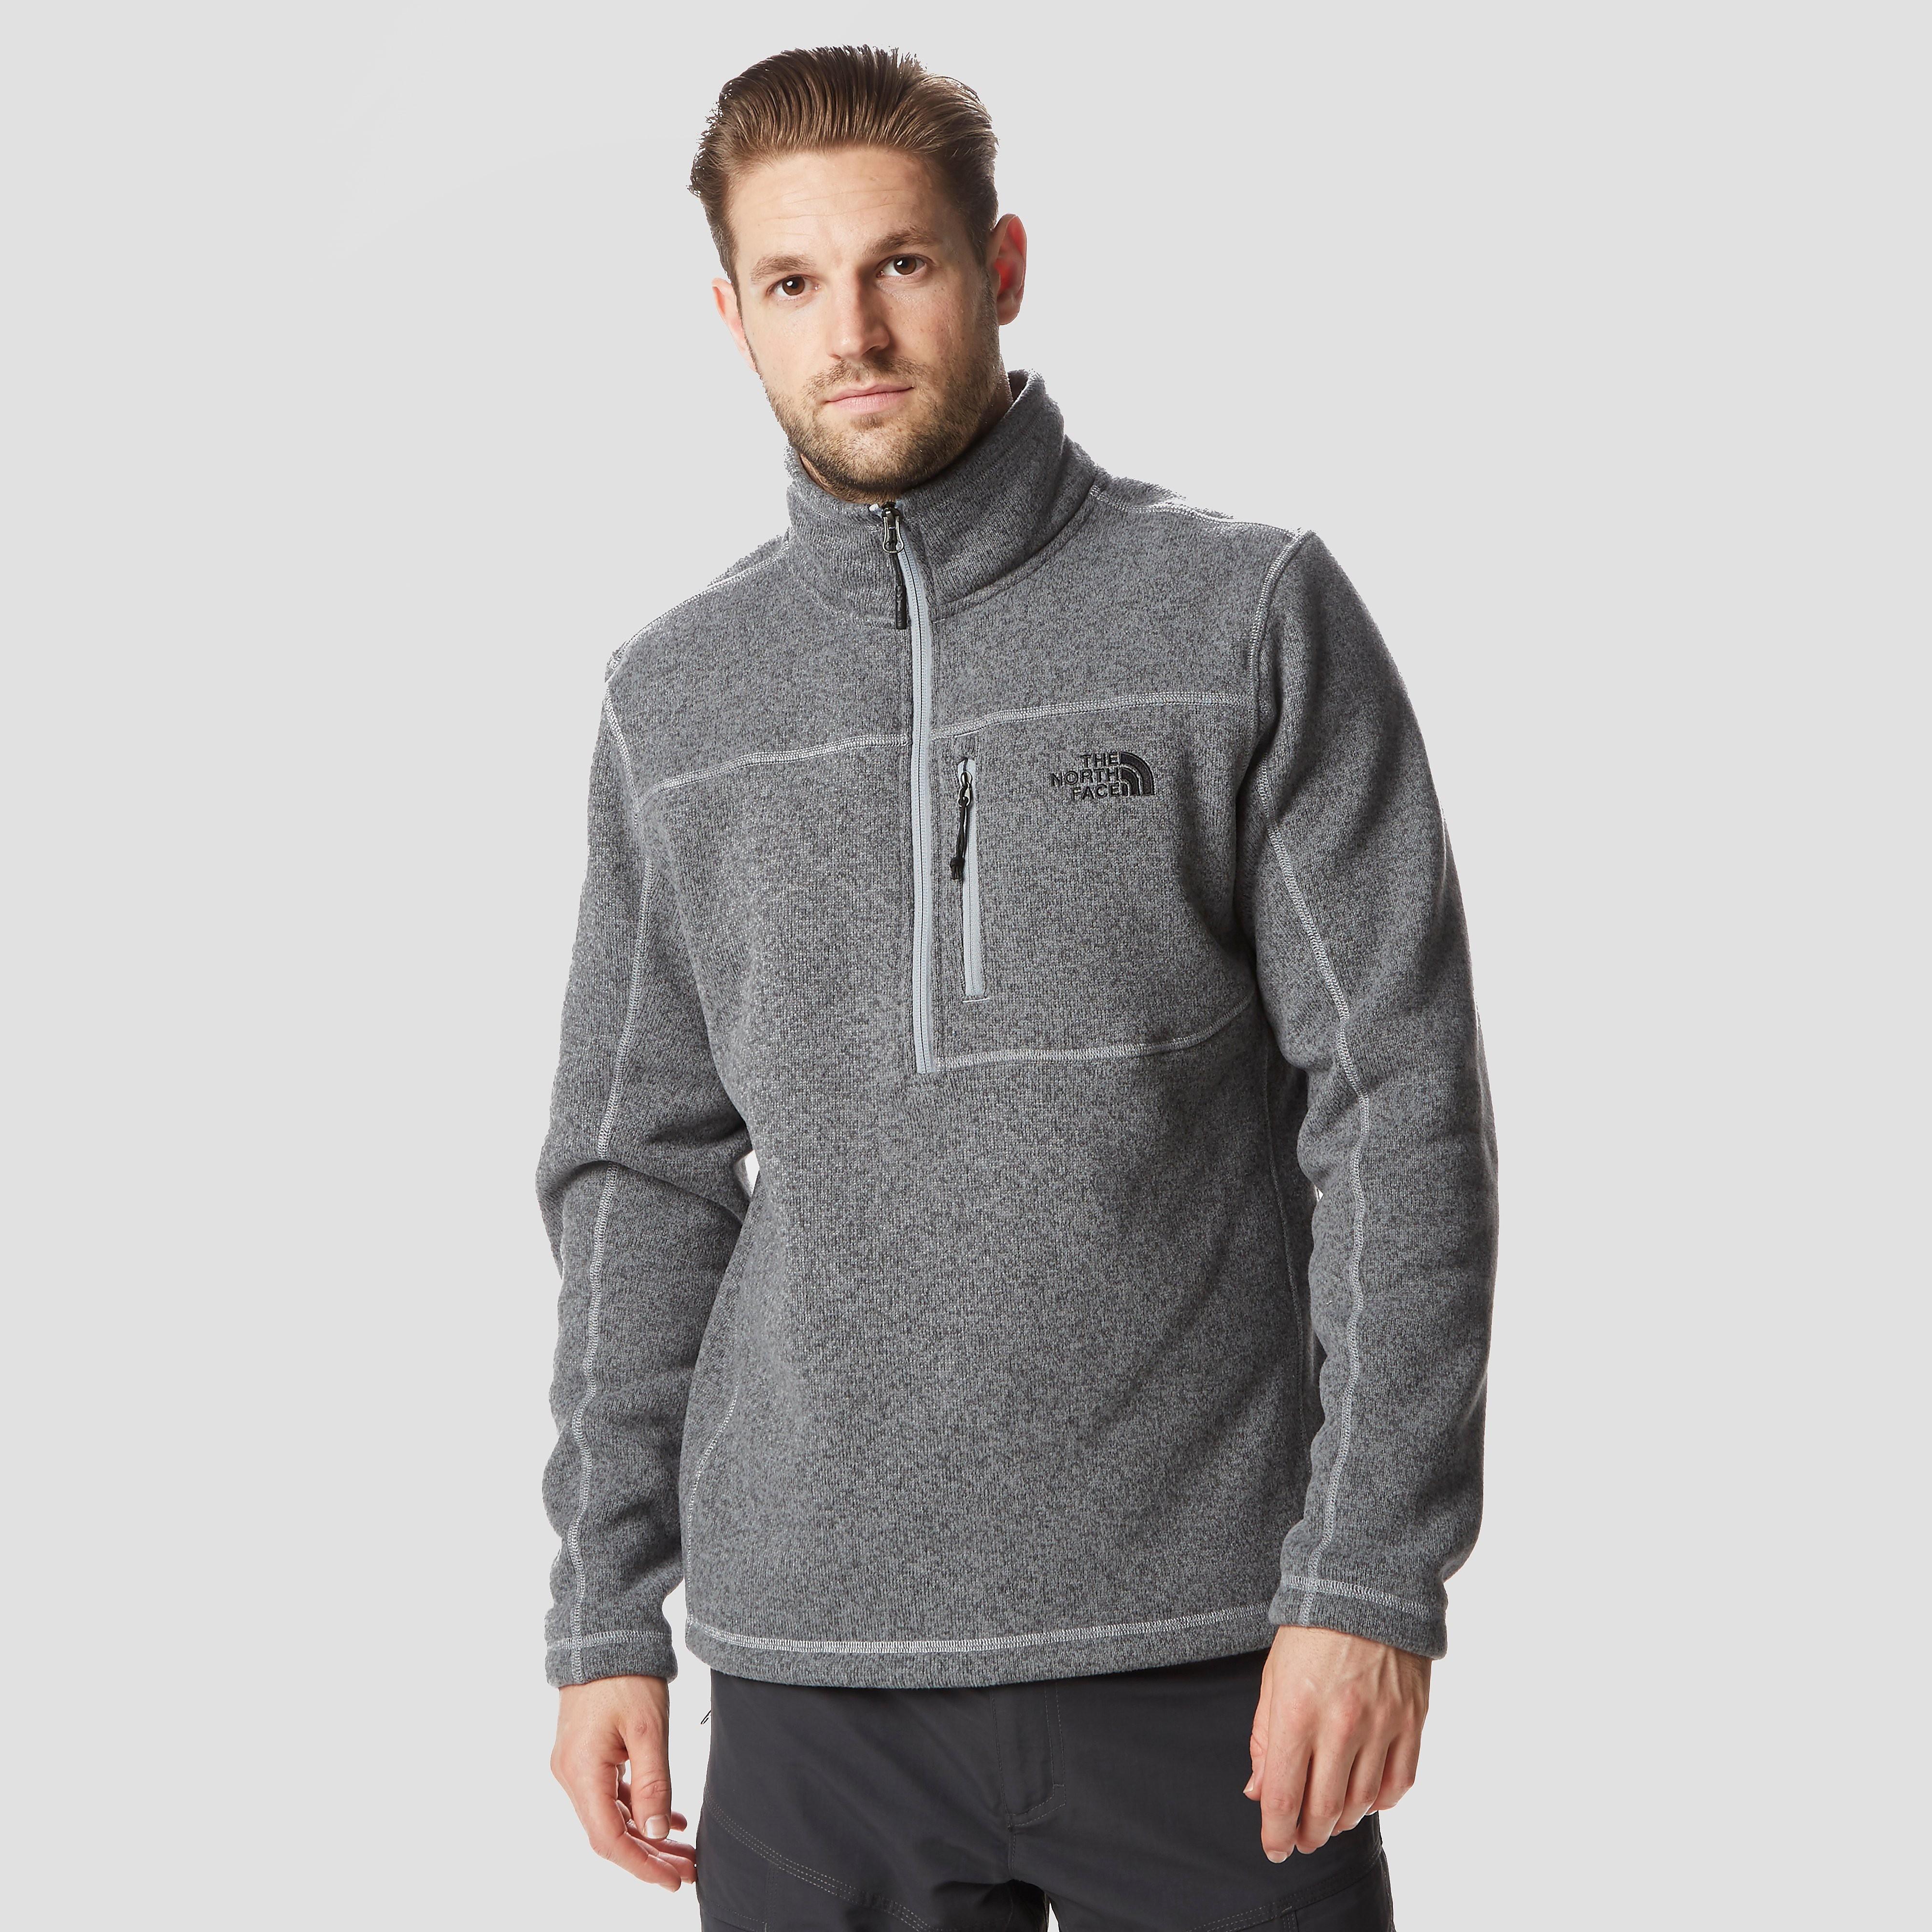 The North Face Men's Gordon Lyons Quarter Zip Fleece